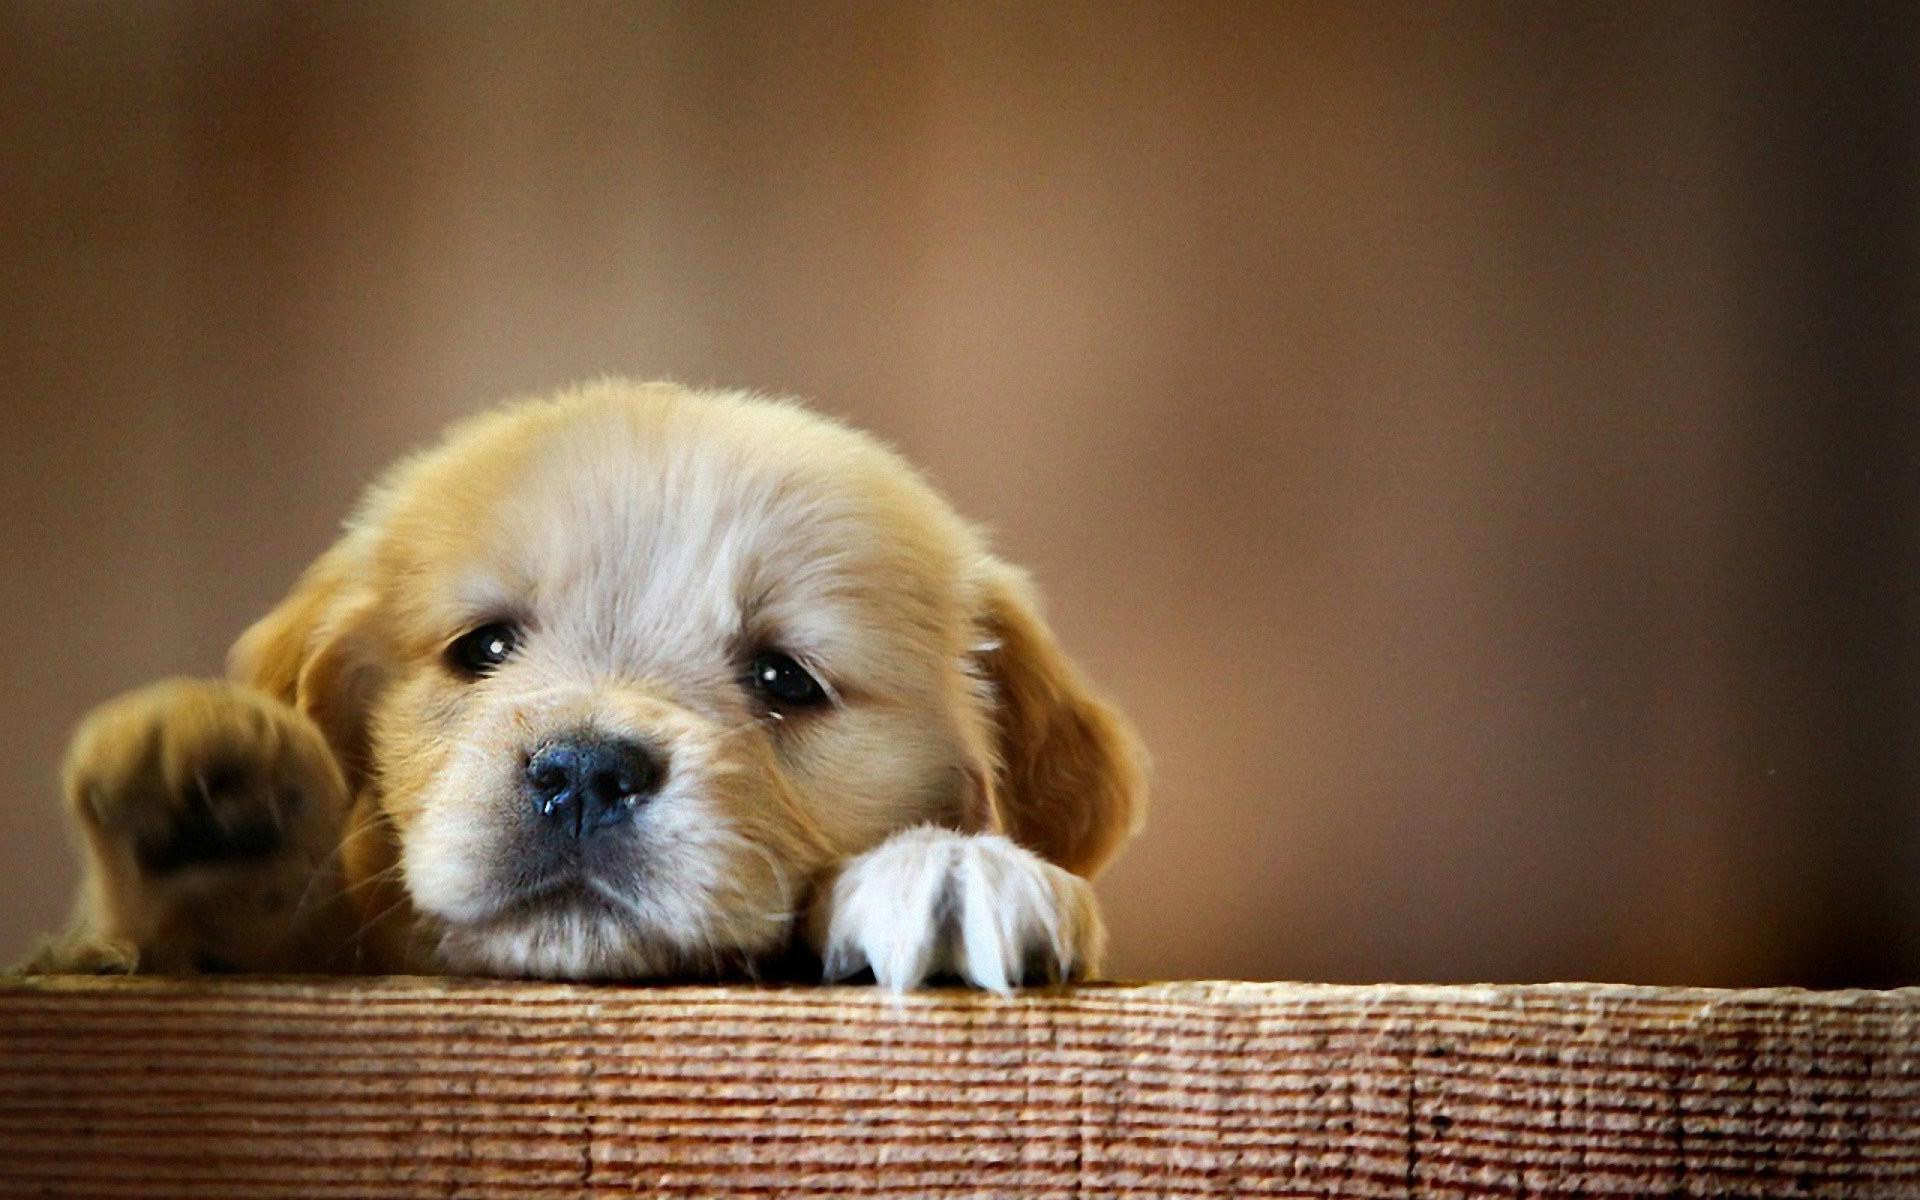 Res: 1920x1200, Cute Cute Baby Dog Desktop Wallpapers | Dogs Wallpapers – Hd Wallpapers  Plus Amazing Pets Wallpaper Desktop